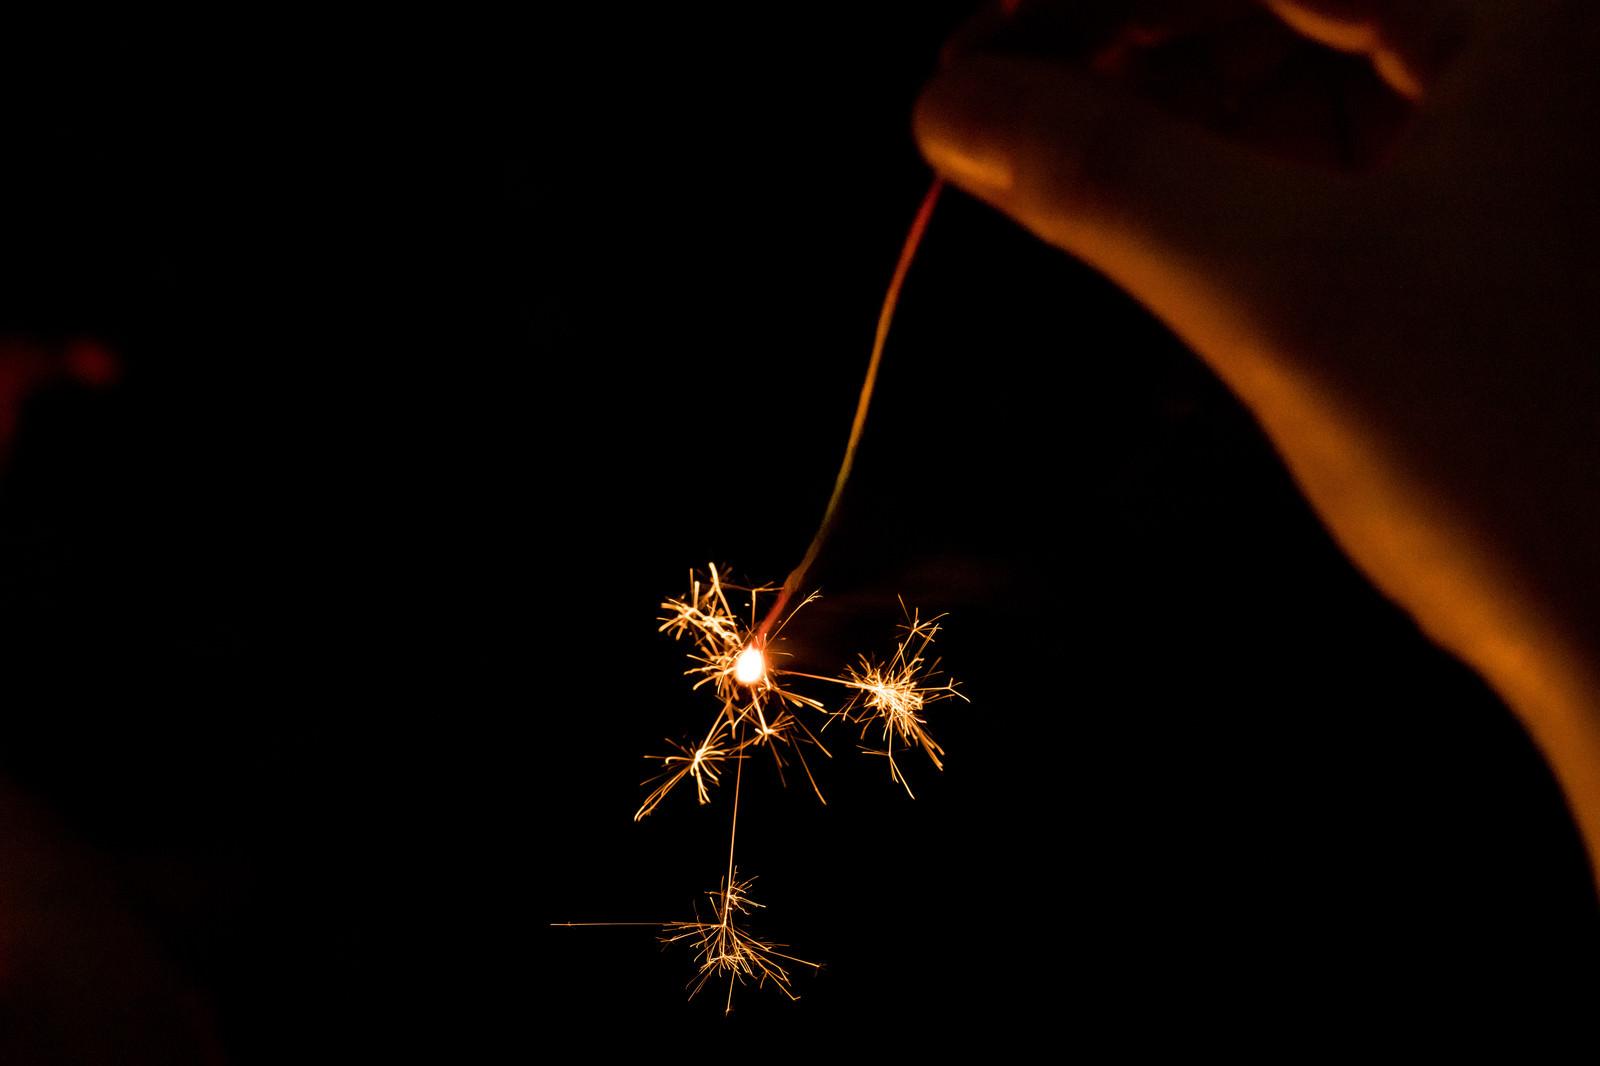 「手持ち線香花火」の写真